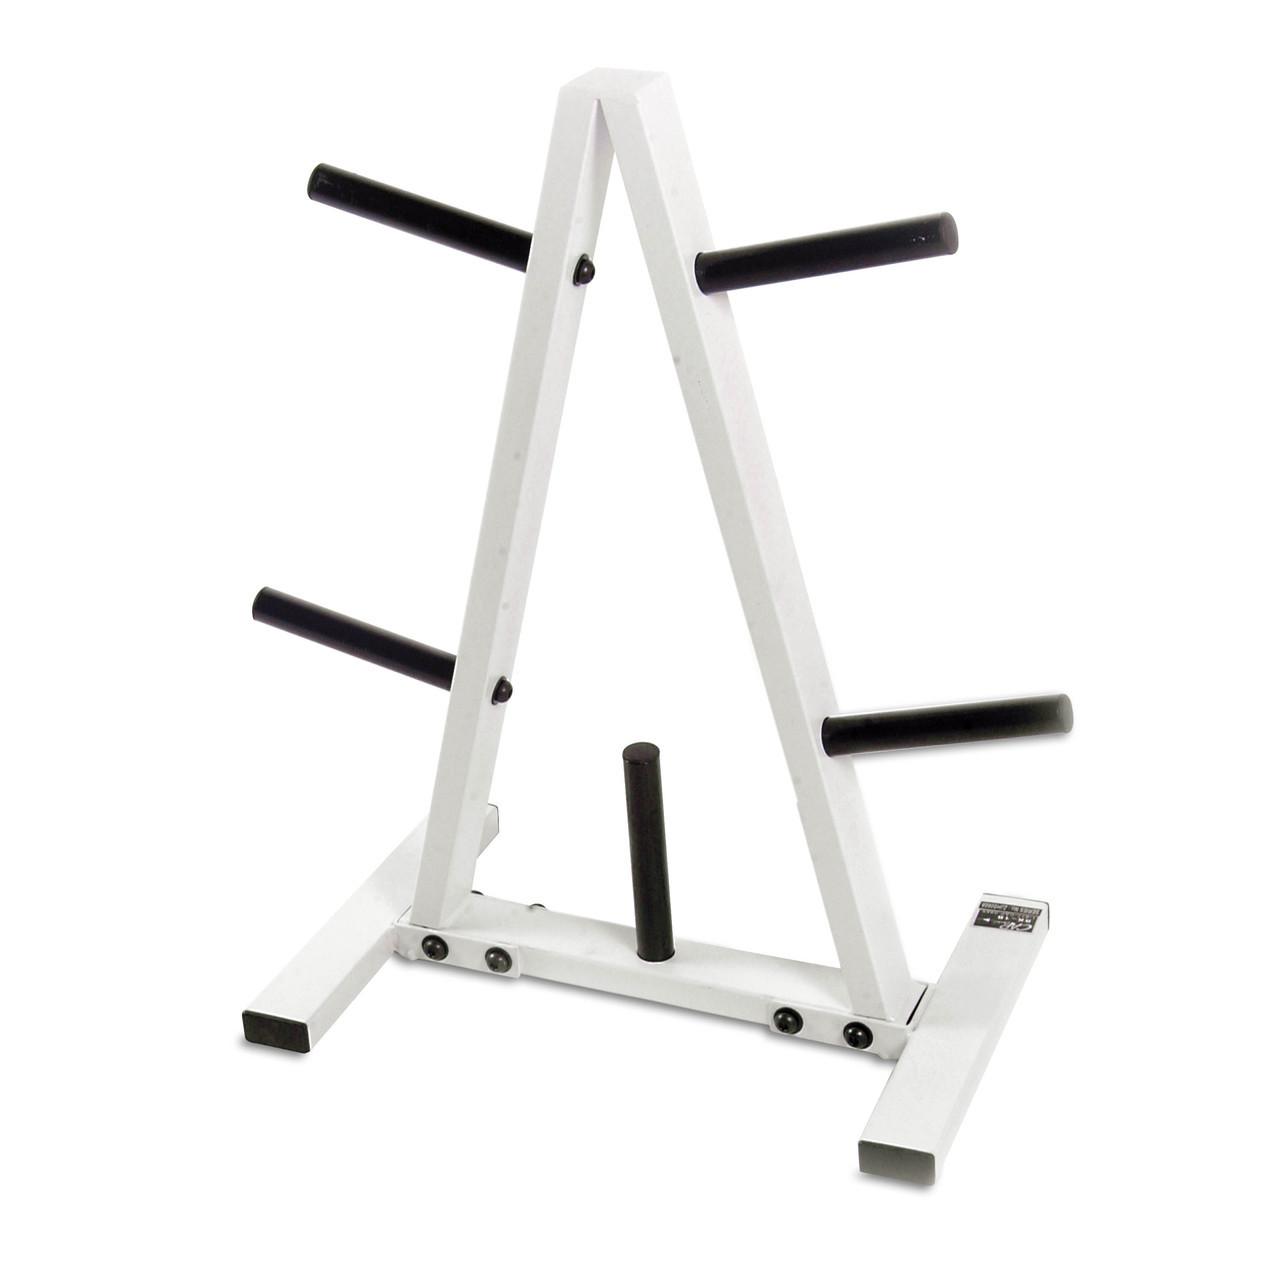 Gym Equipment u003e Weight Lifting Equipment u003e Weight Storage Racks u003e Weight Plate Racks u003e CAP 1u201d Plate Rack Home Use  sc 1 st  Workout Healthy & CAP 1u201d Plate Rack Home Use